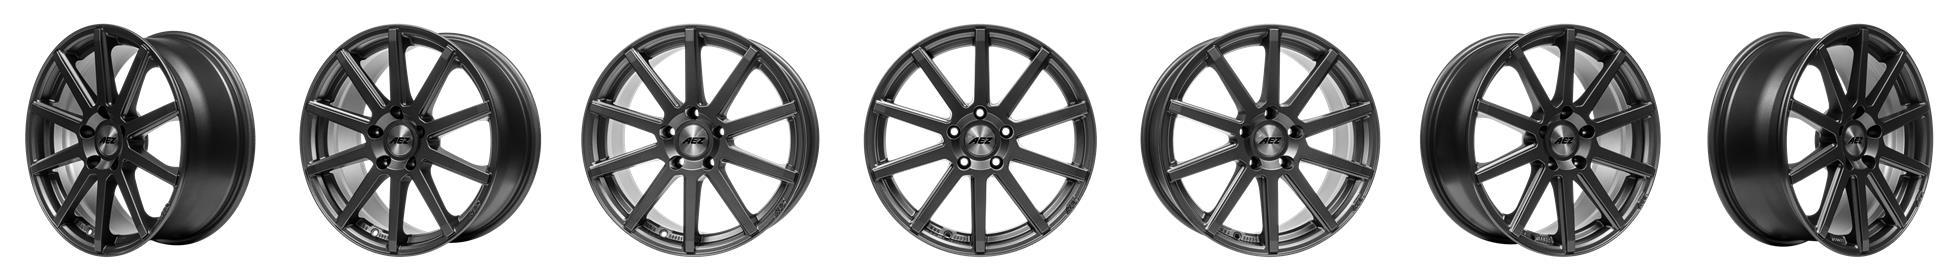 Alfa Romeo Stelvio 20 Lichtmetalen Velgen Oponeonl